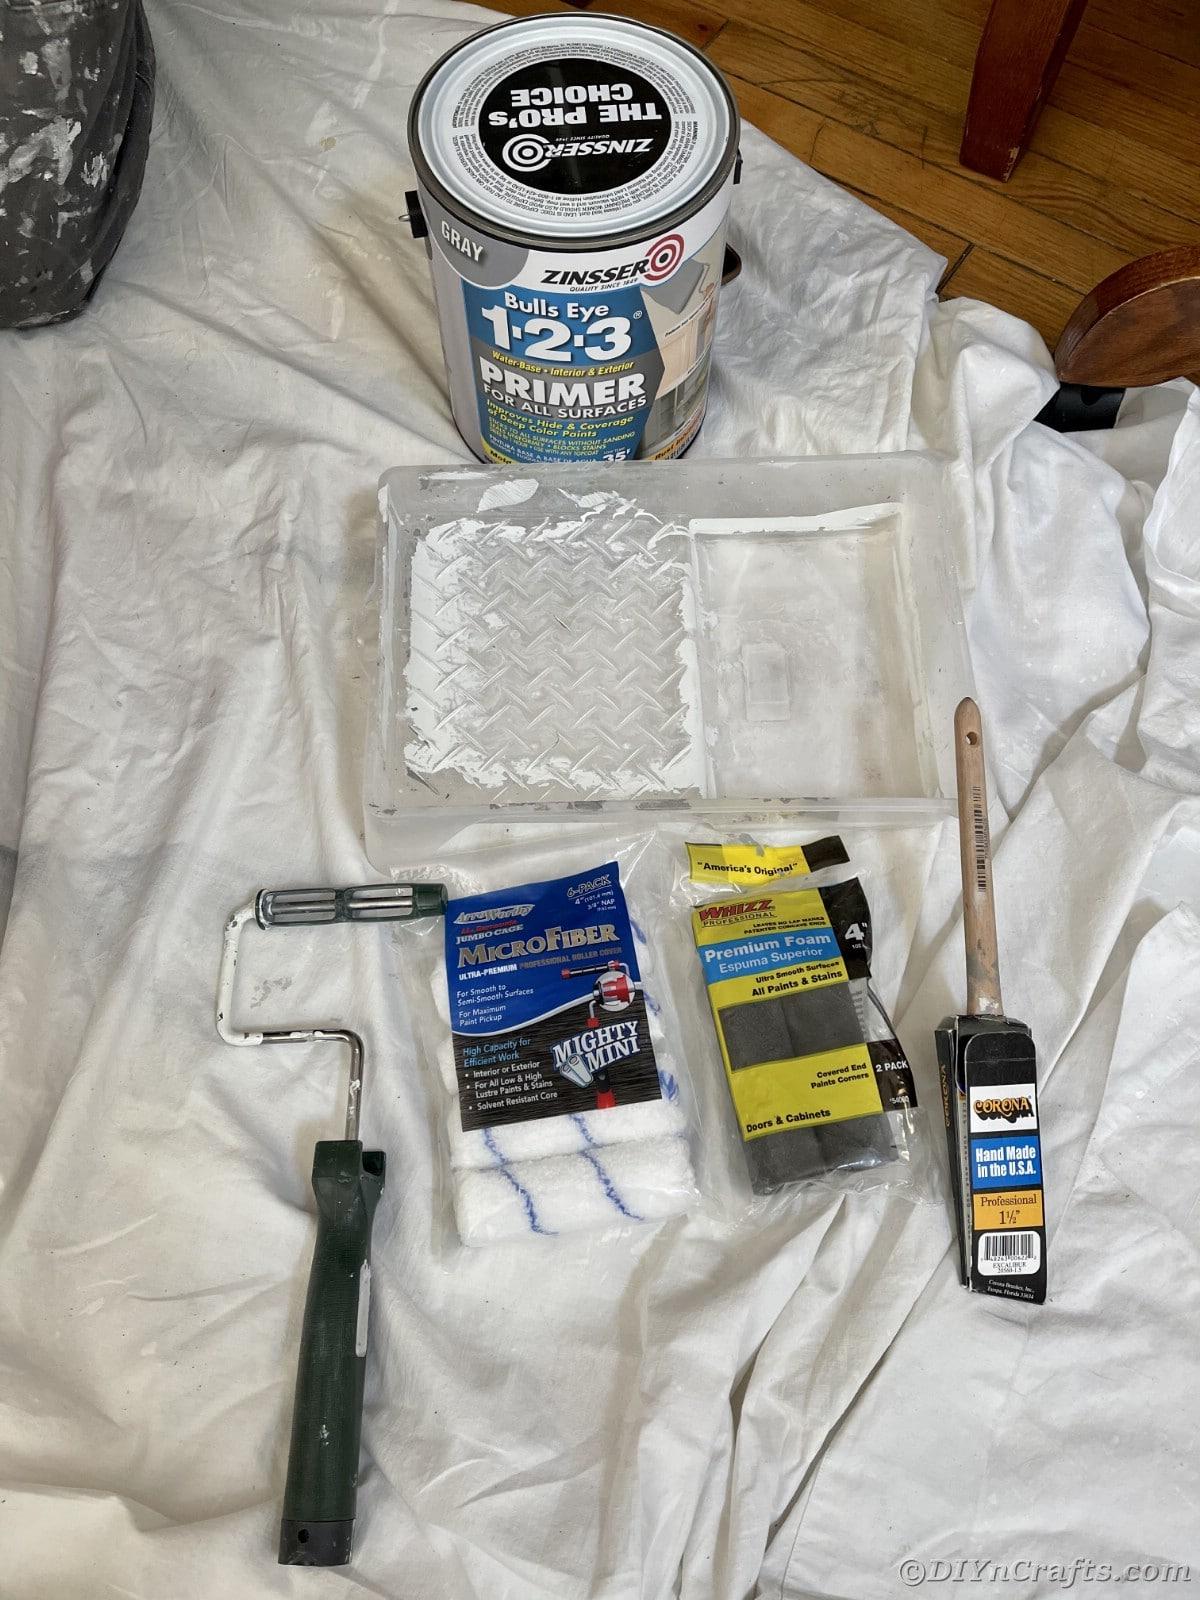 Supplies on drop cloth